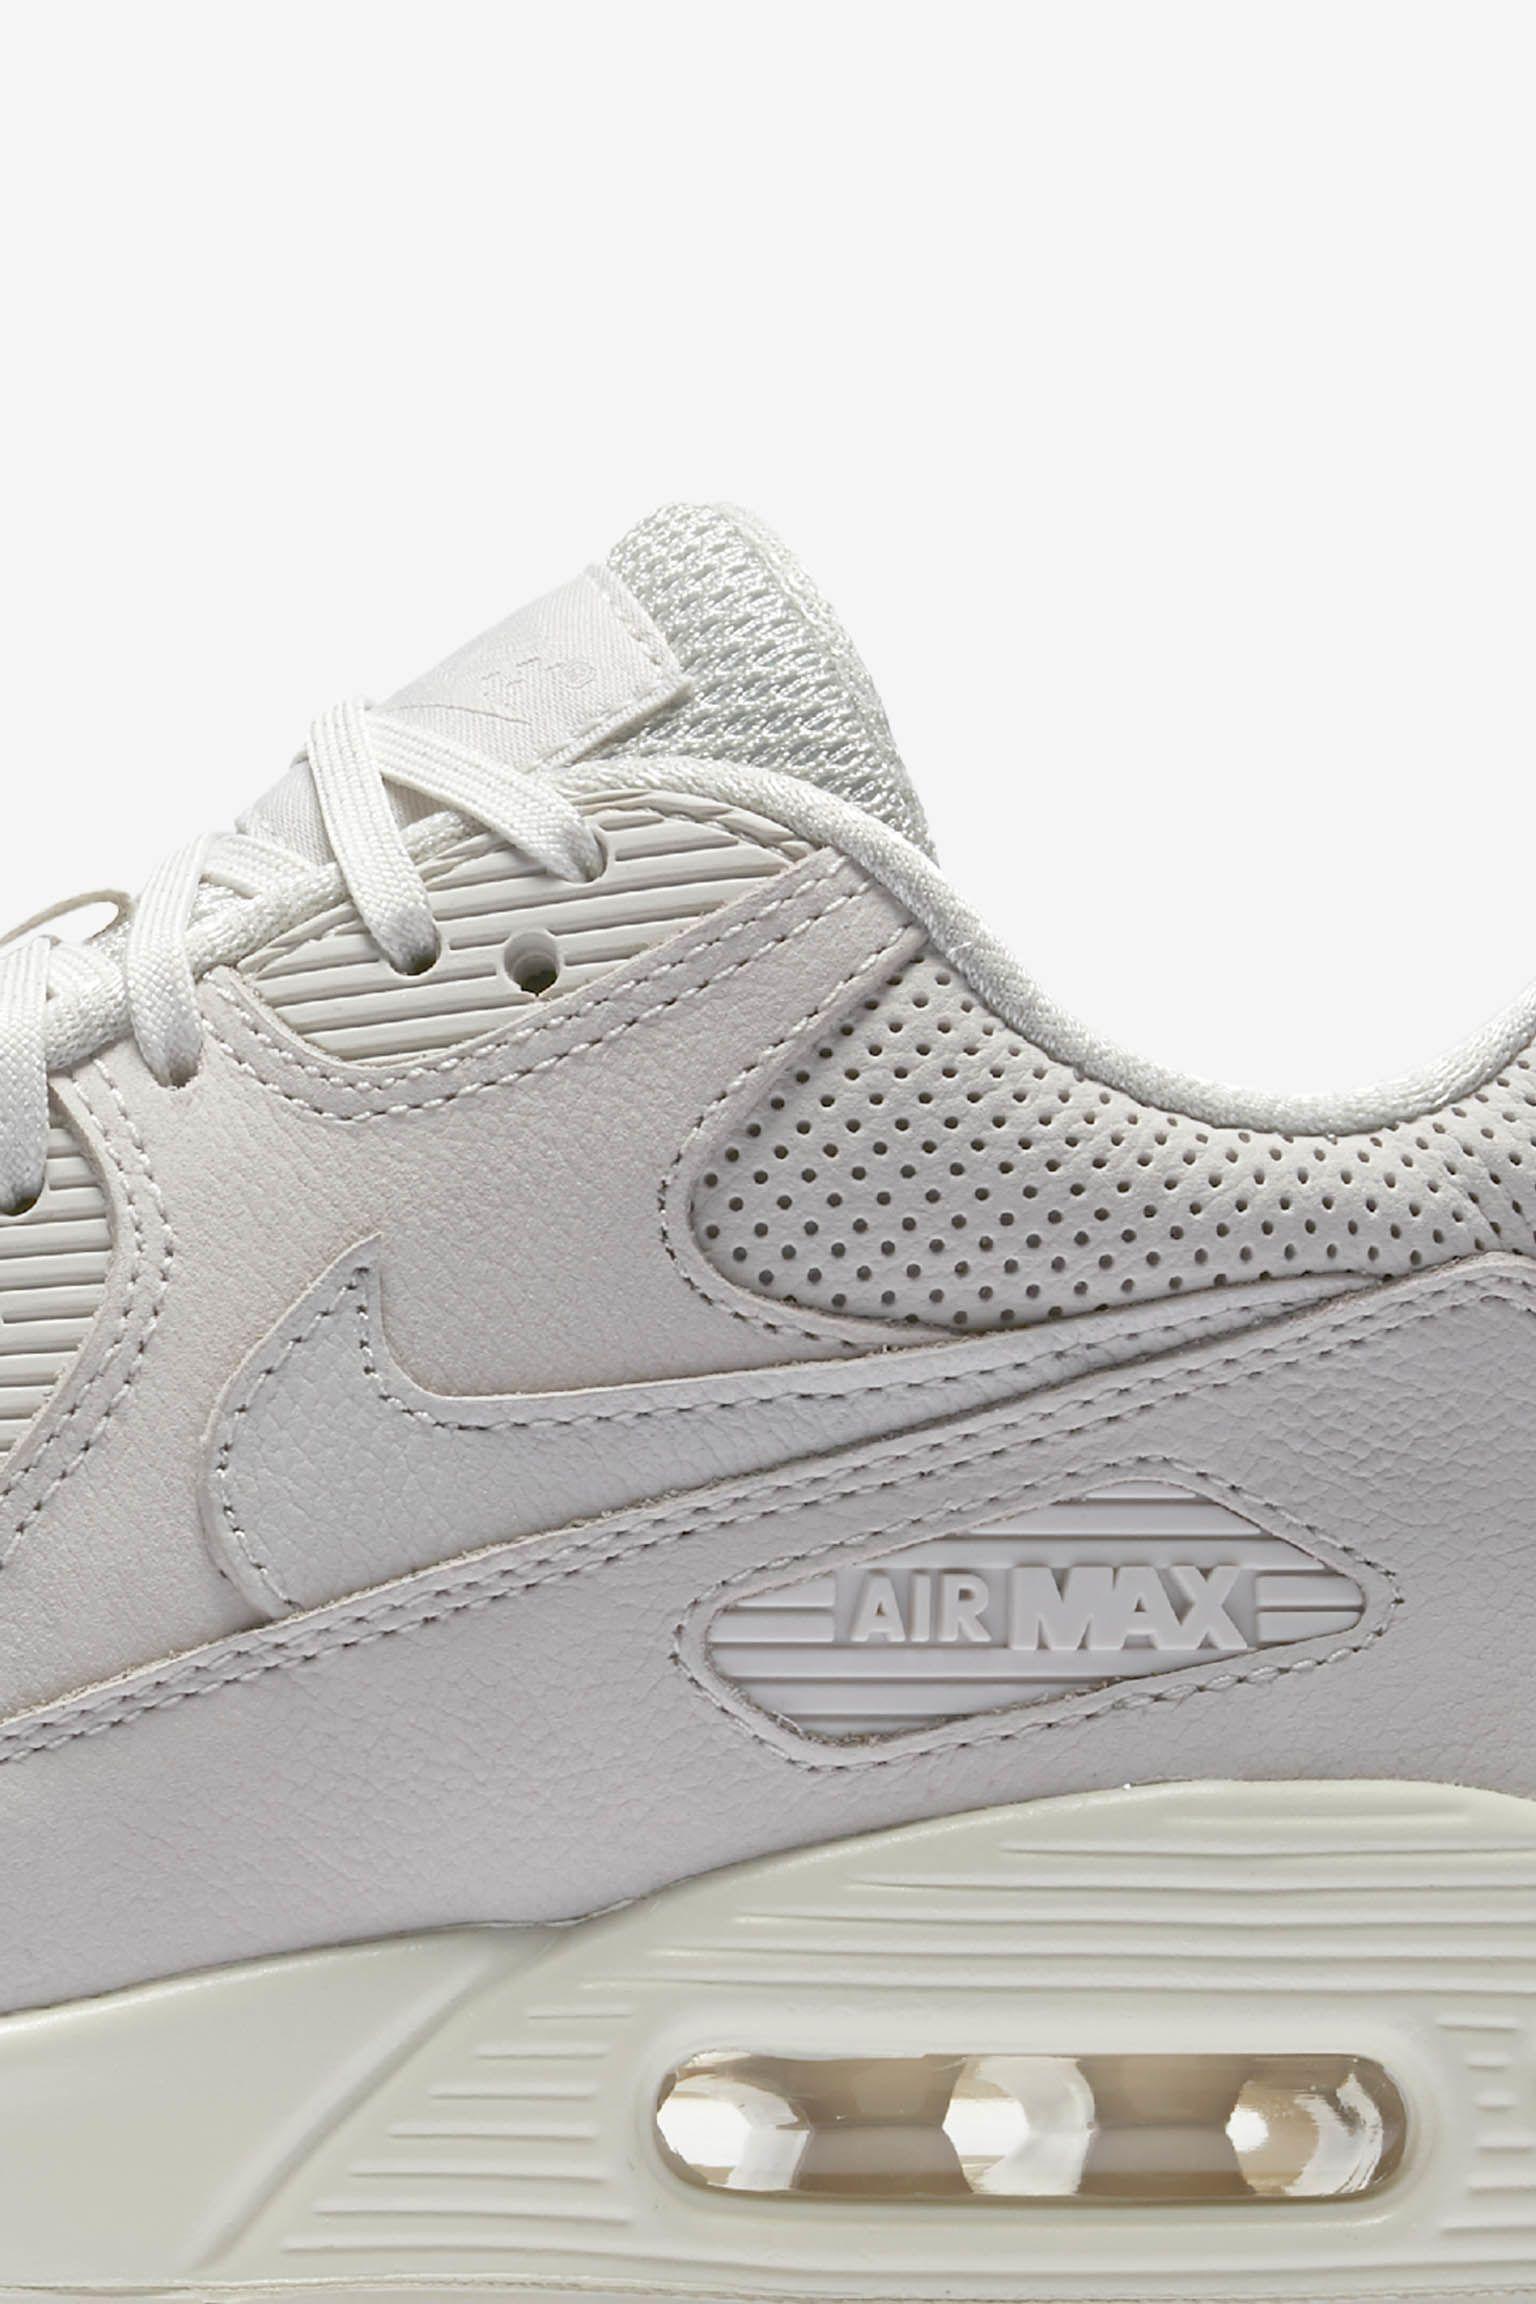 Women s Nike Air Max 90 Pinnacle  Light Bone . Nike+ Launch GB 8f9417c8e